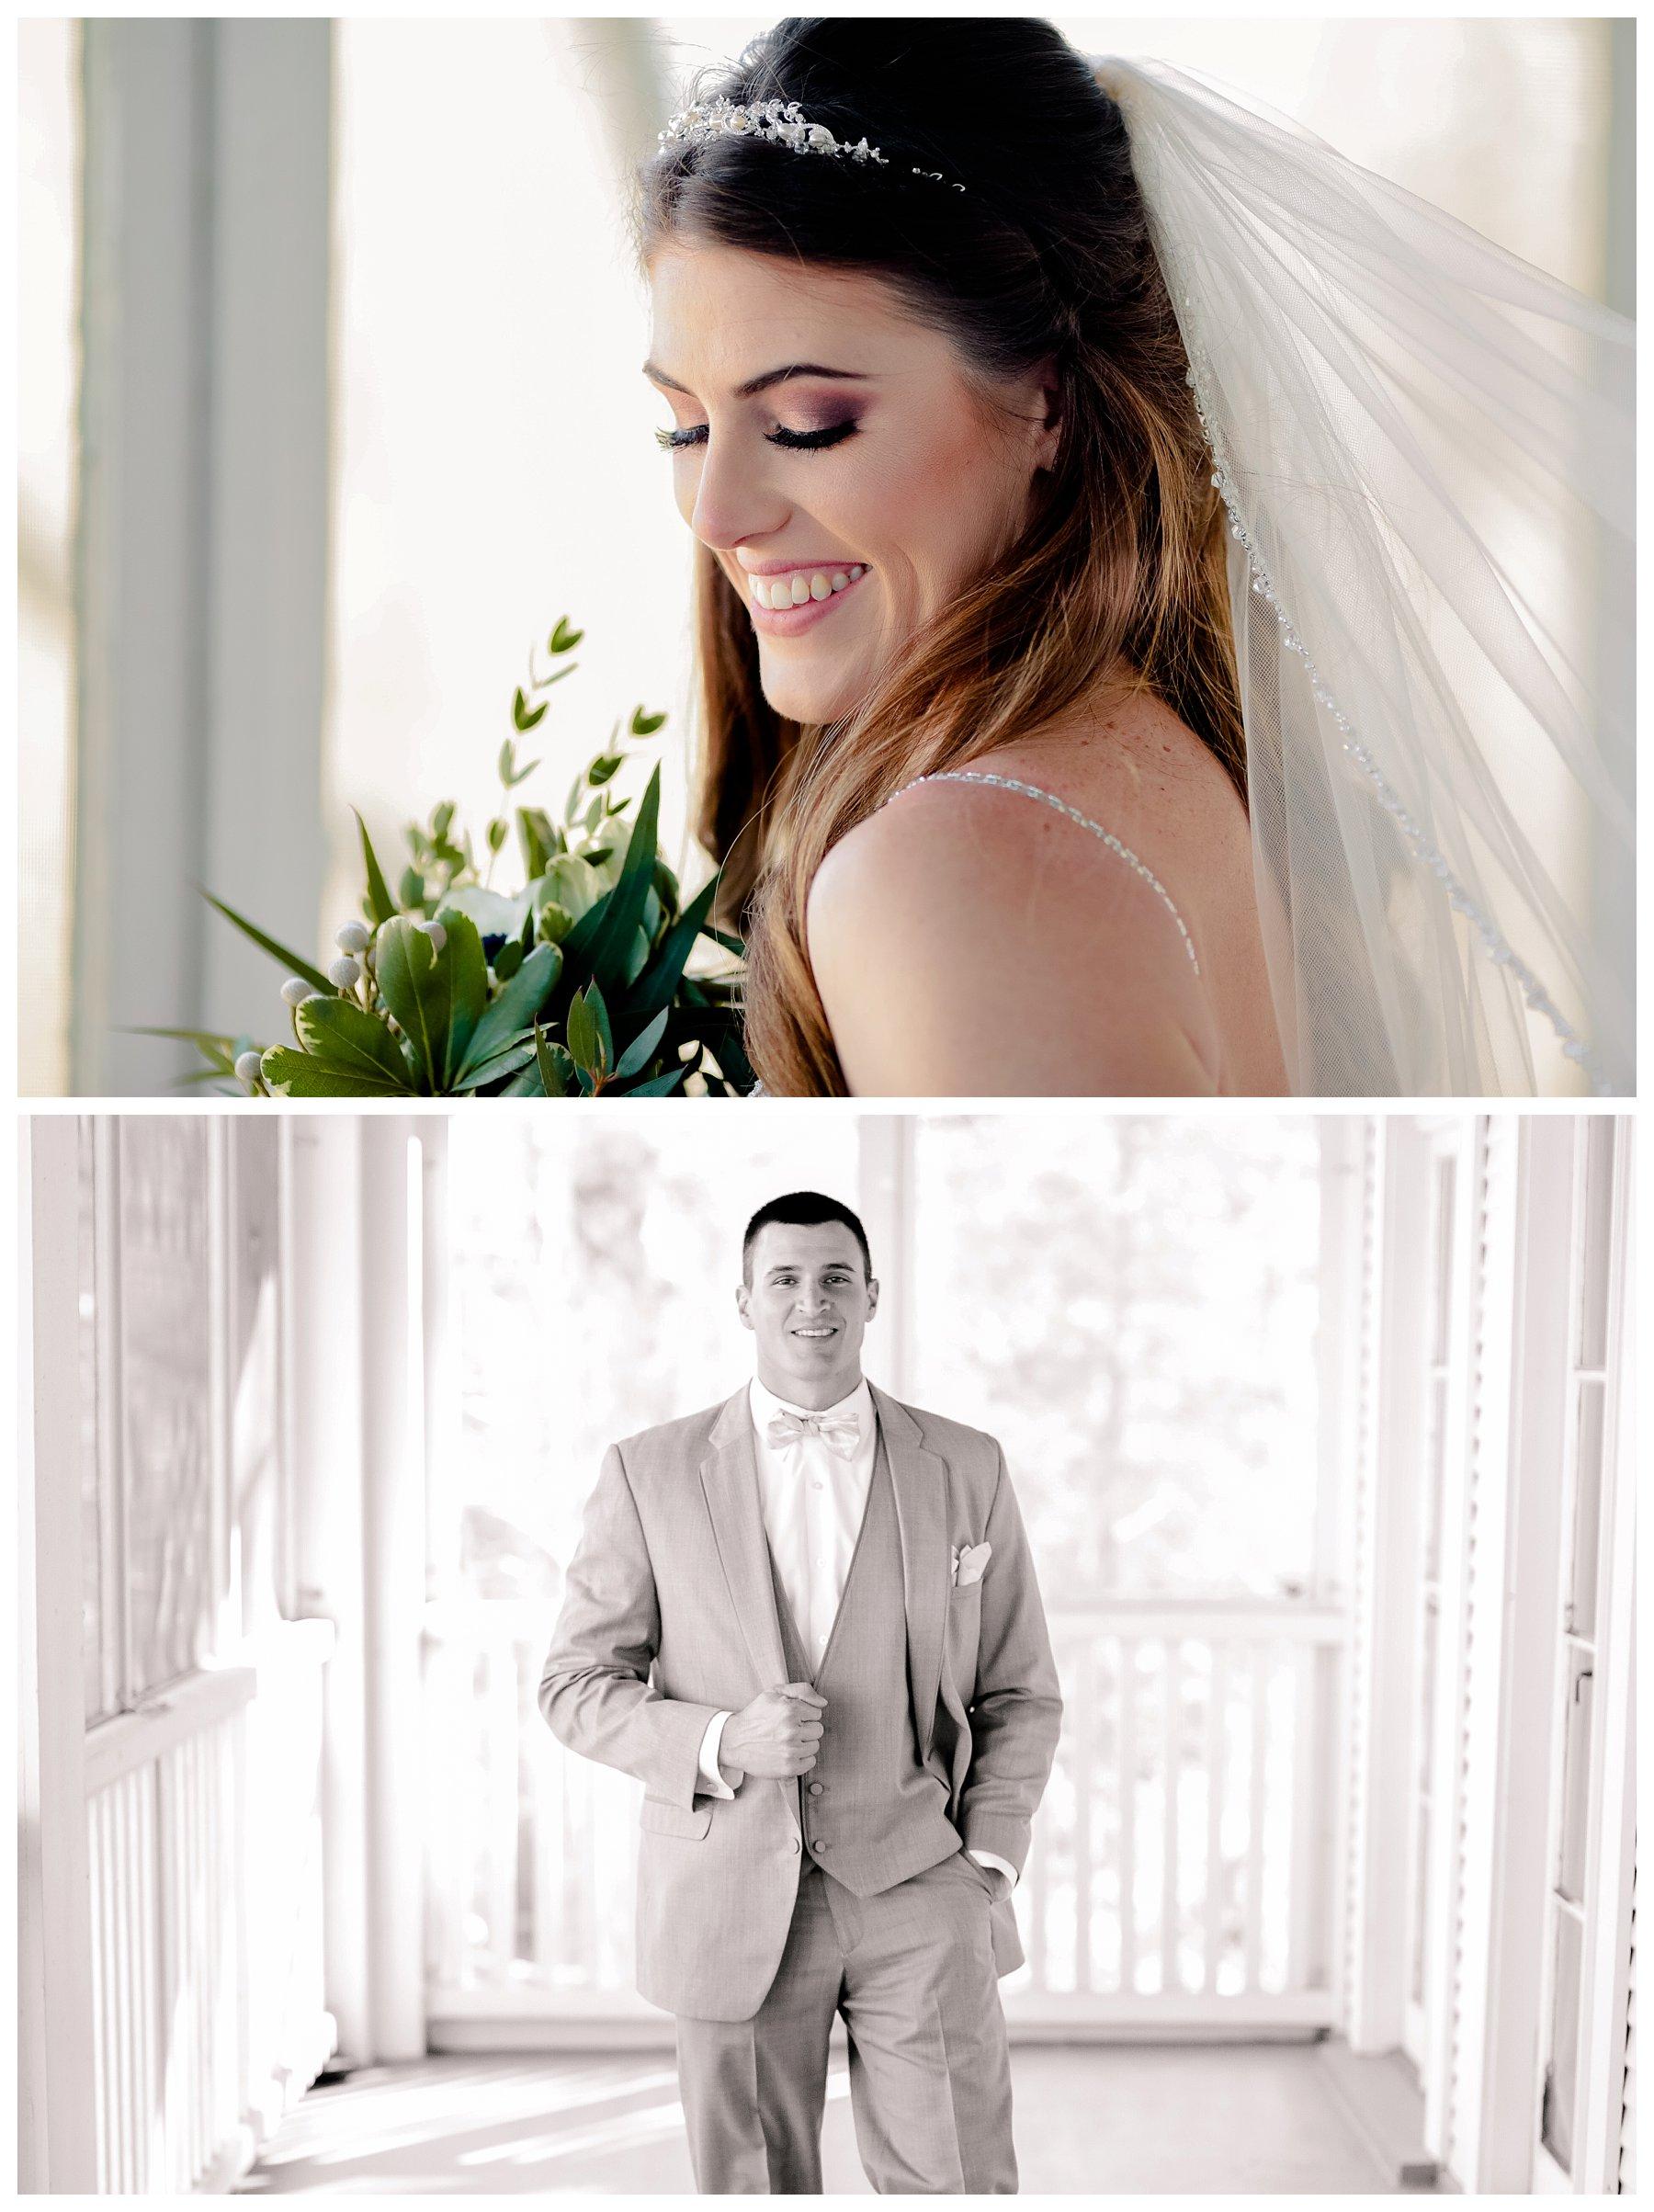 photographer_wedding_saint_louis_Kansas_City_Photography_Videography_workshop_training_styled_engagement_Lake_Ozark_KC_MO_STL_Rolla_Hermann_Saint_James_0366.jpg